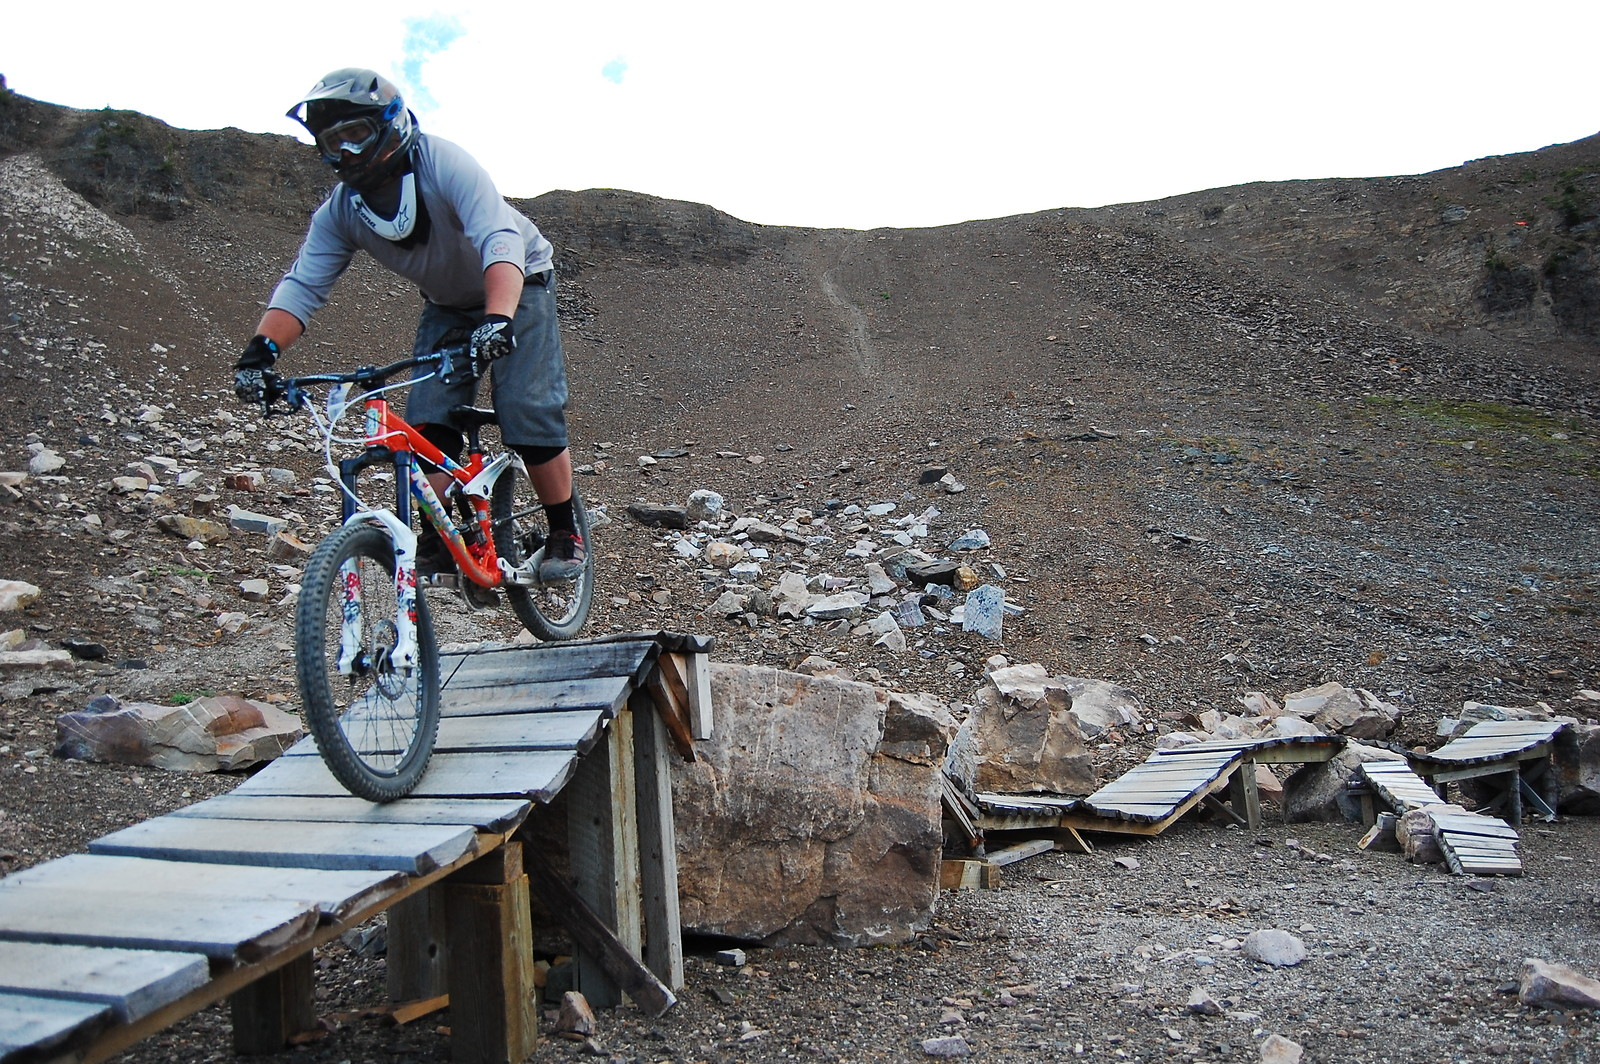 Freeride, Kicking Horse Mounainresort, BC, Canada - dennis.leidelmeijer - Mountain Biking Pictures - Vital MTB